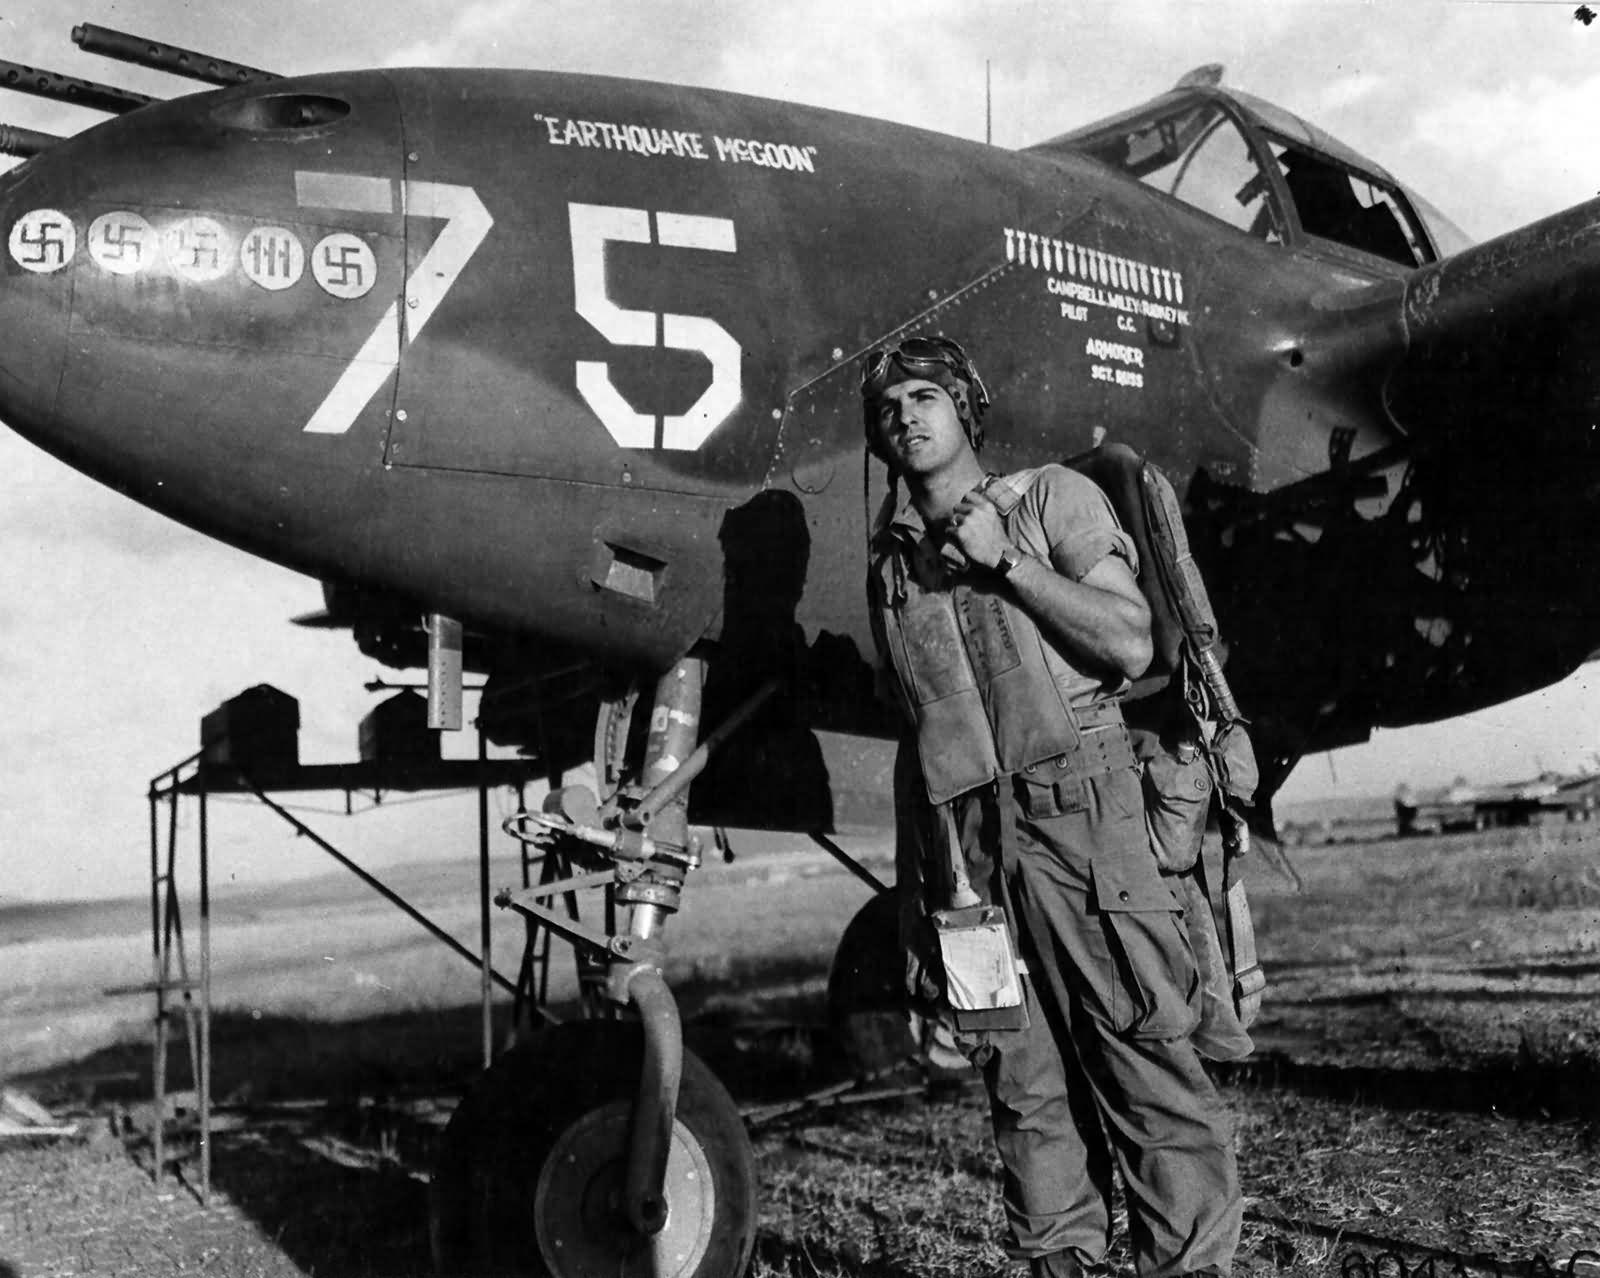 P 38 Lightning 75 Earthquake Mcgoon Pilot Lt Richard Campbell